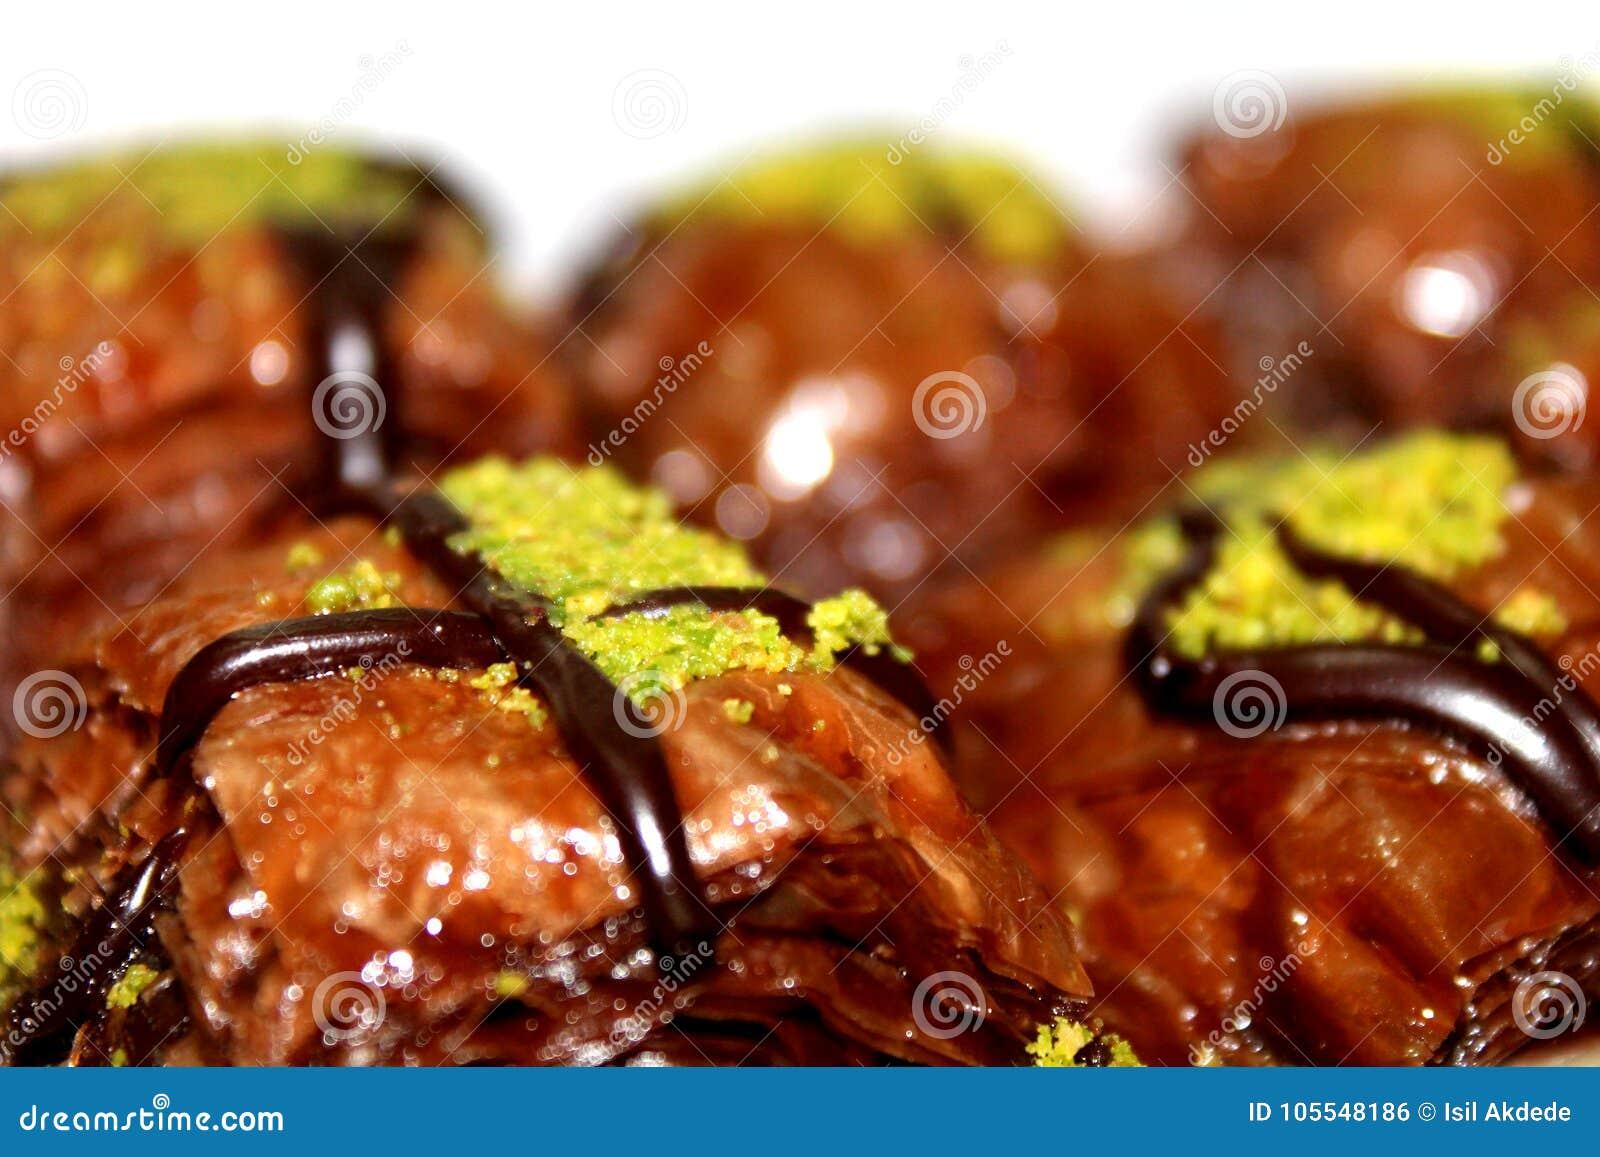 Chocolate Baklava Dessert